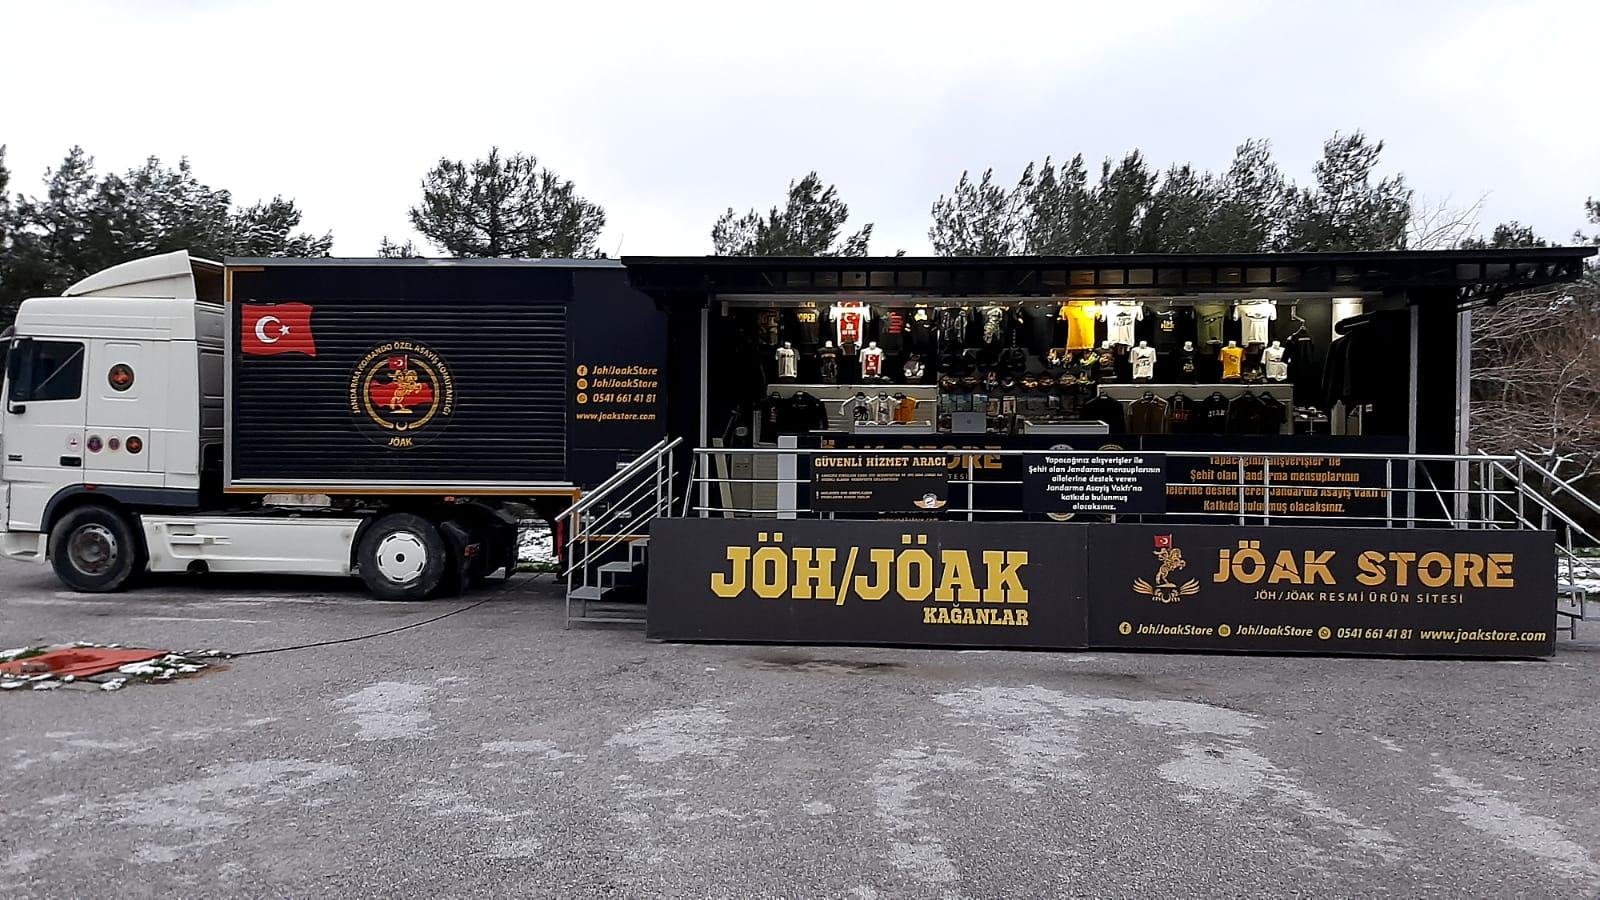 JÖAK Store